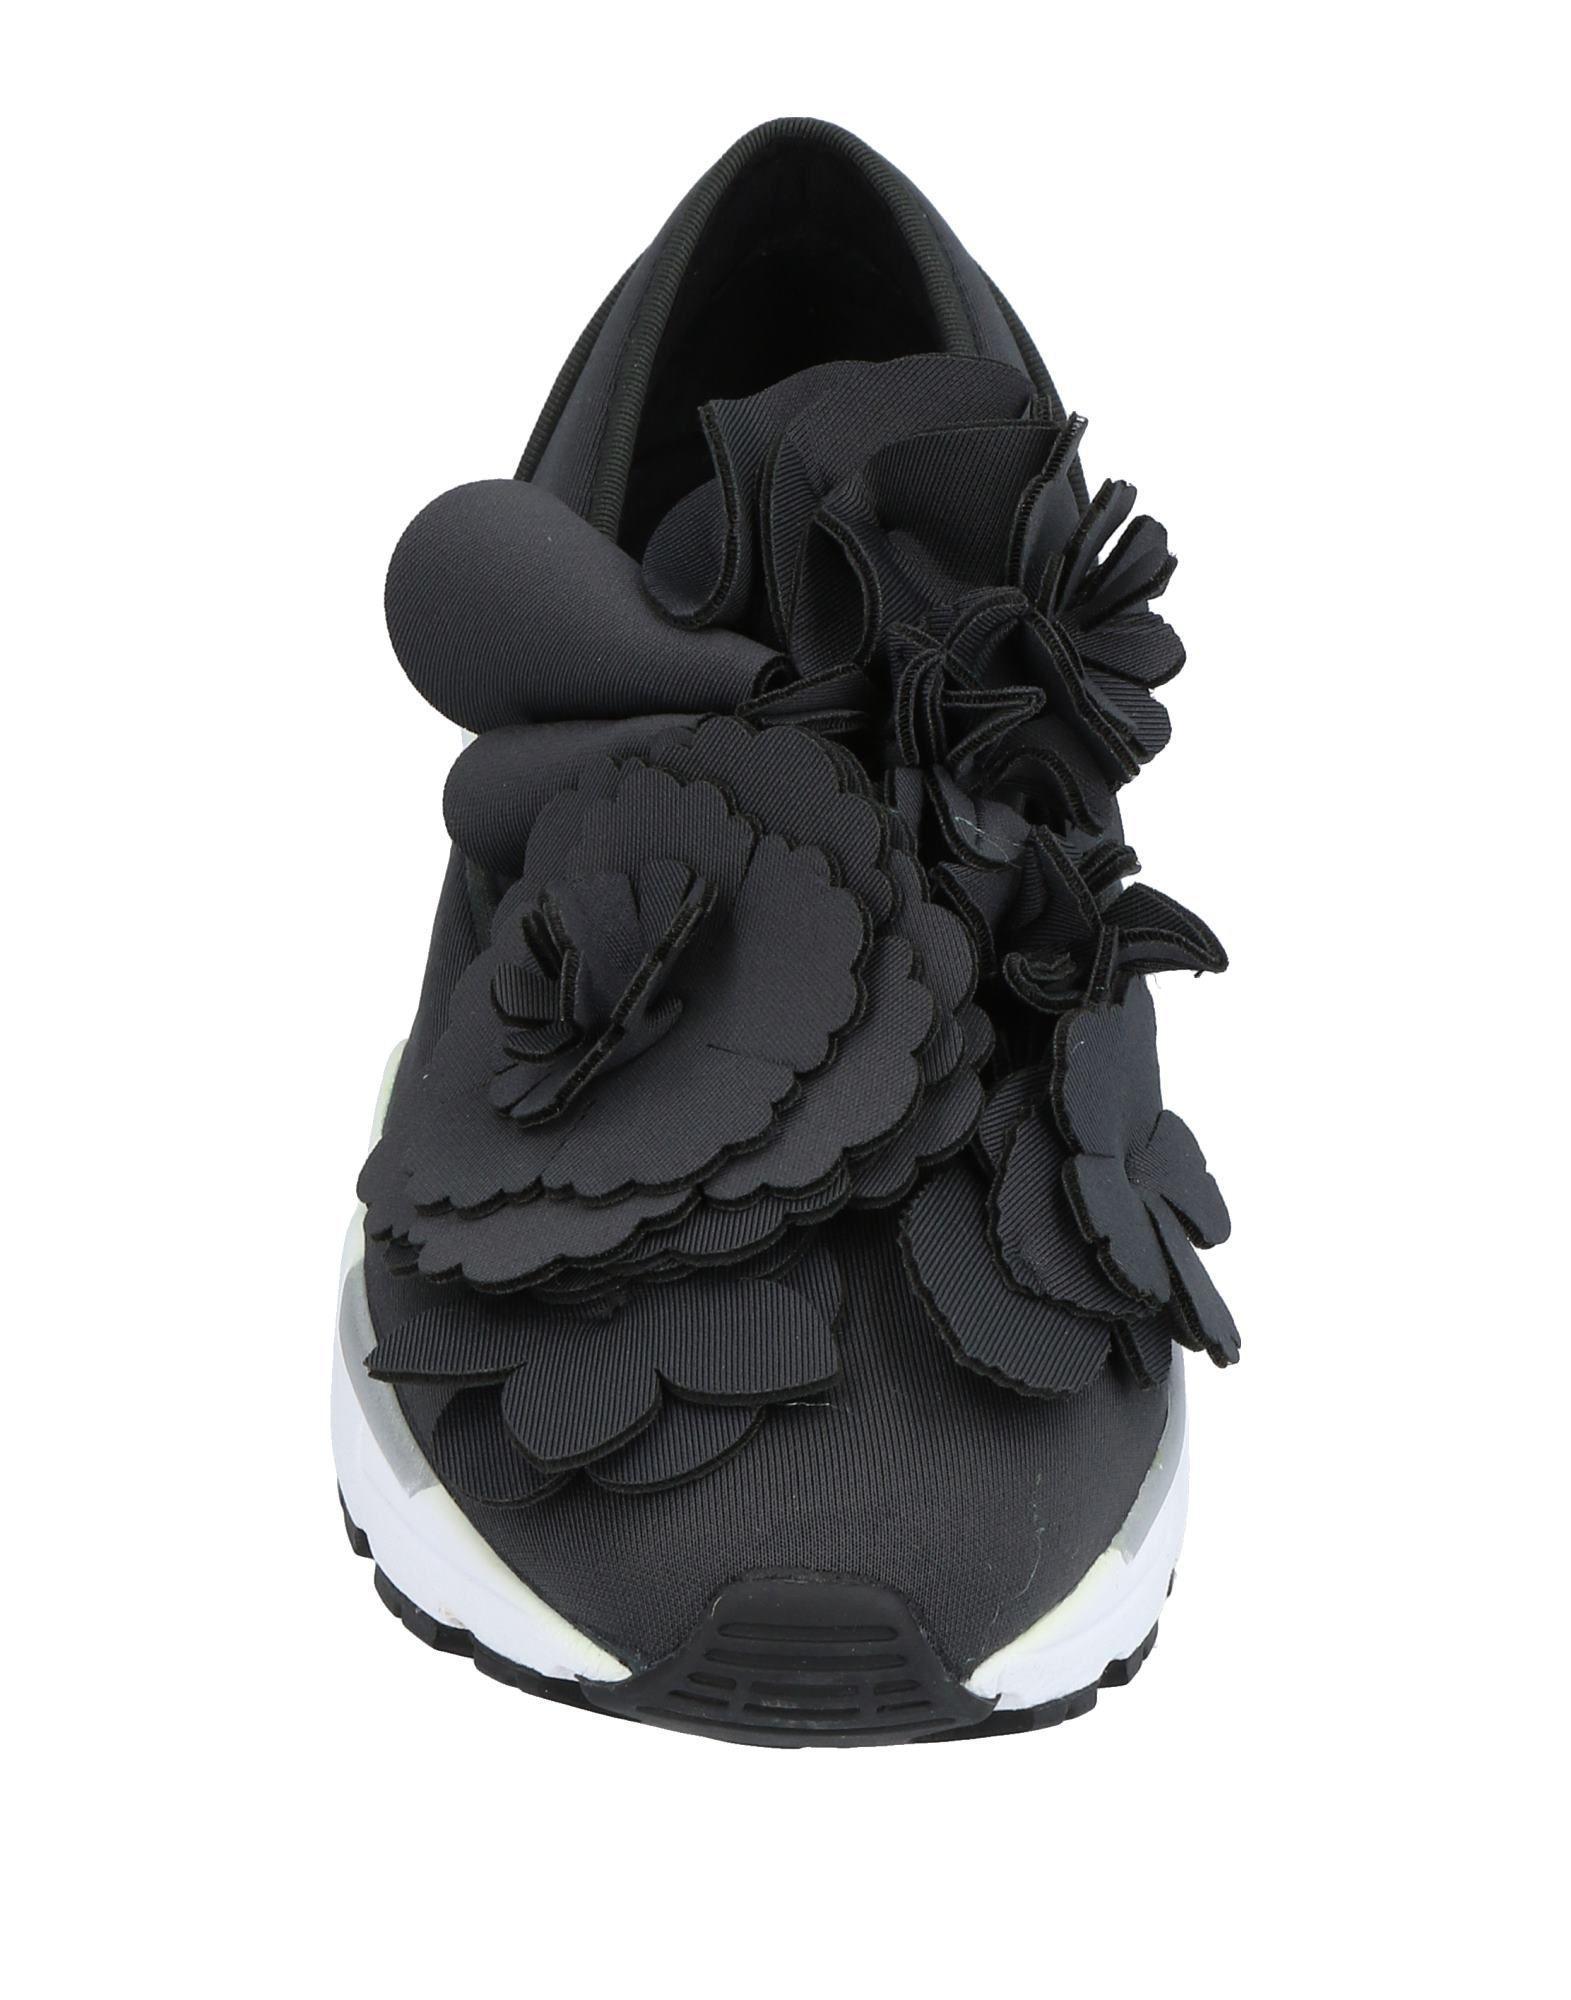 Suecomma Bonnie Synthetic Low-tops & Sneakers in Steel Grey (Grey)